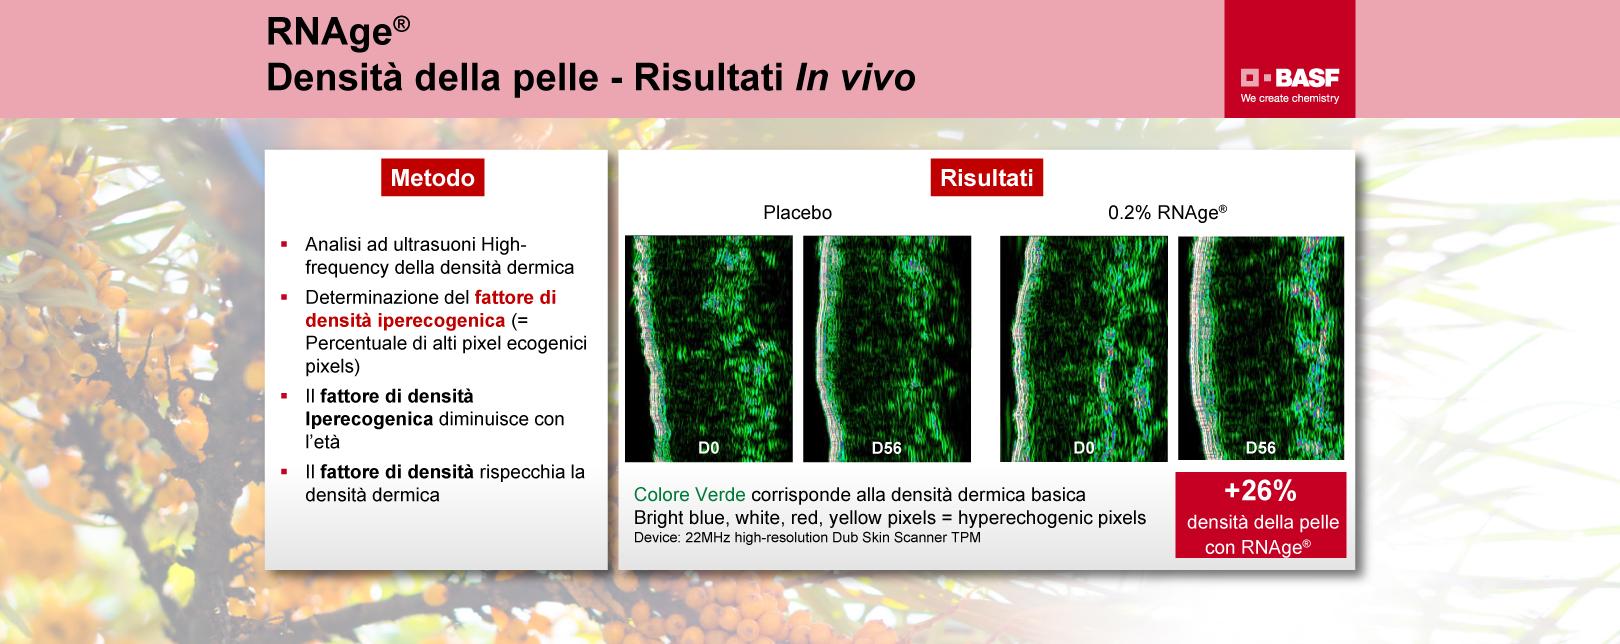 RNAge-densita-della-pelle